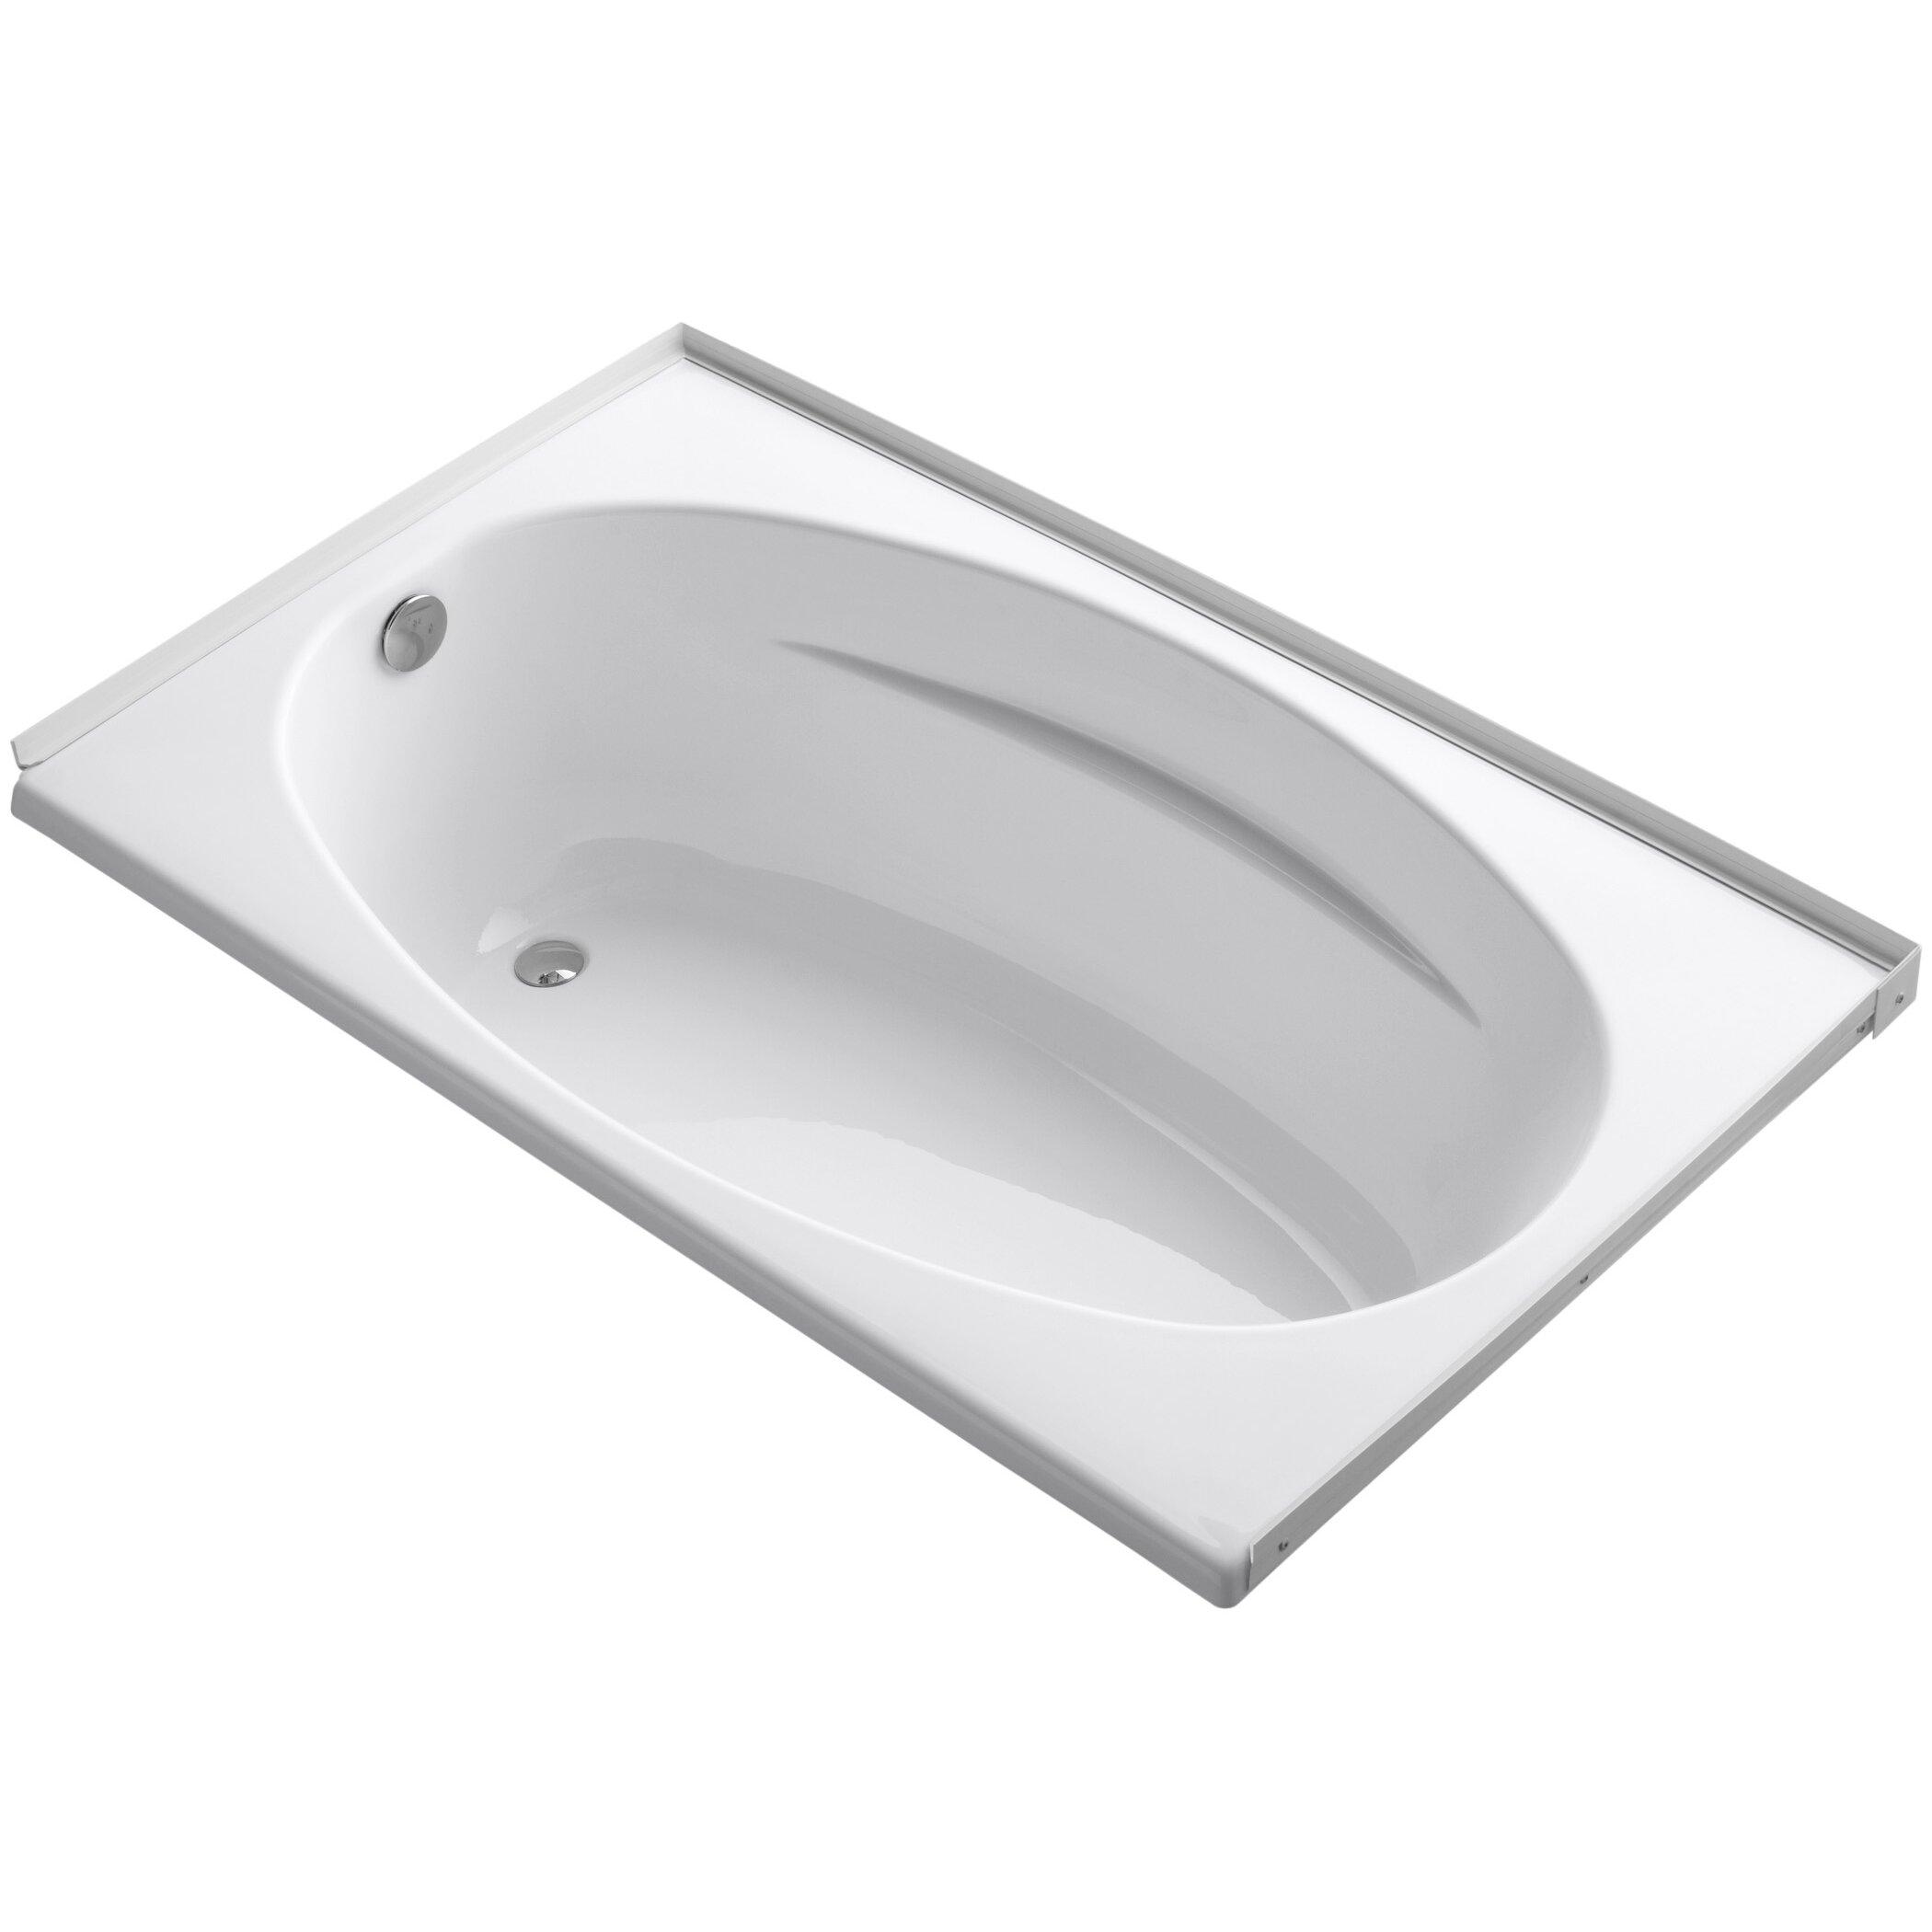 Alcove  X  Soaking Bathtub AllModern - Freestanding tub end drain